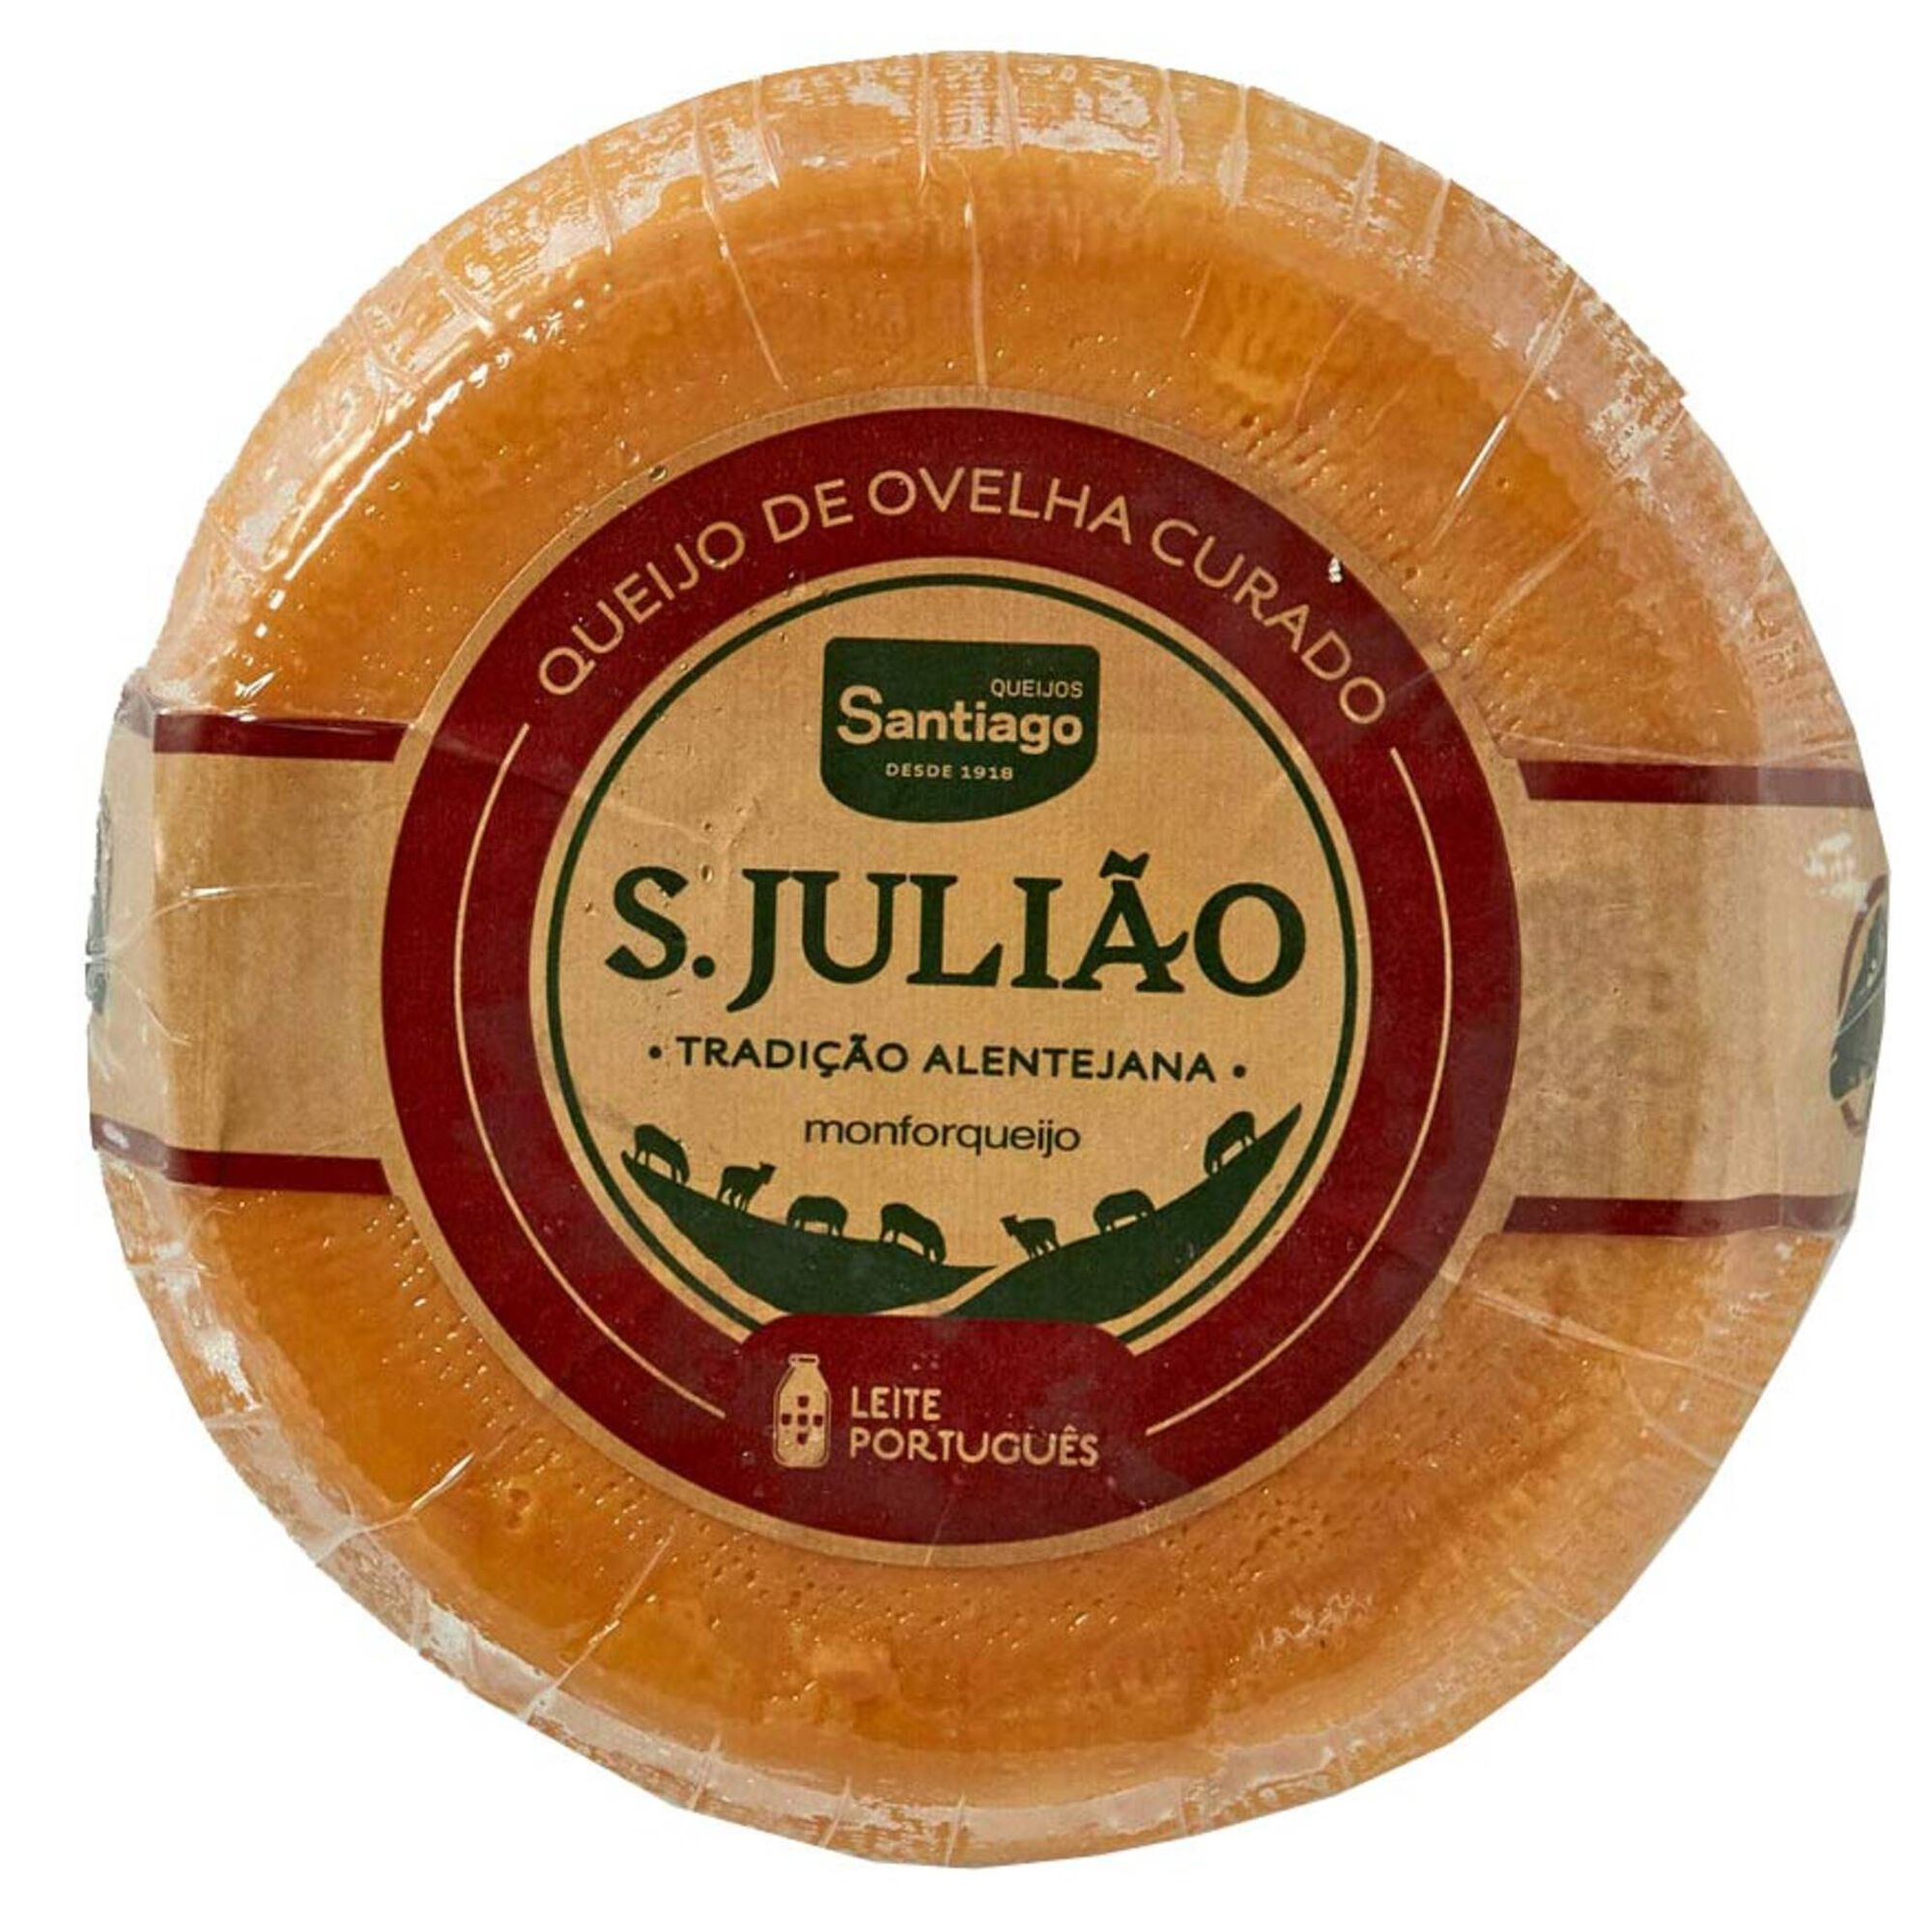 Merendeira de Ovelha S. Julião